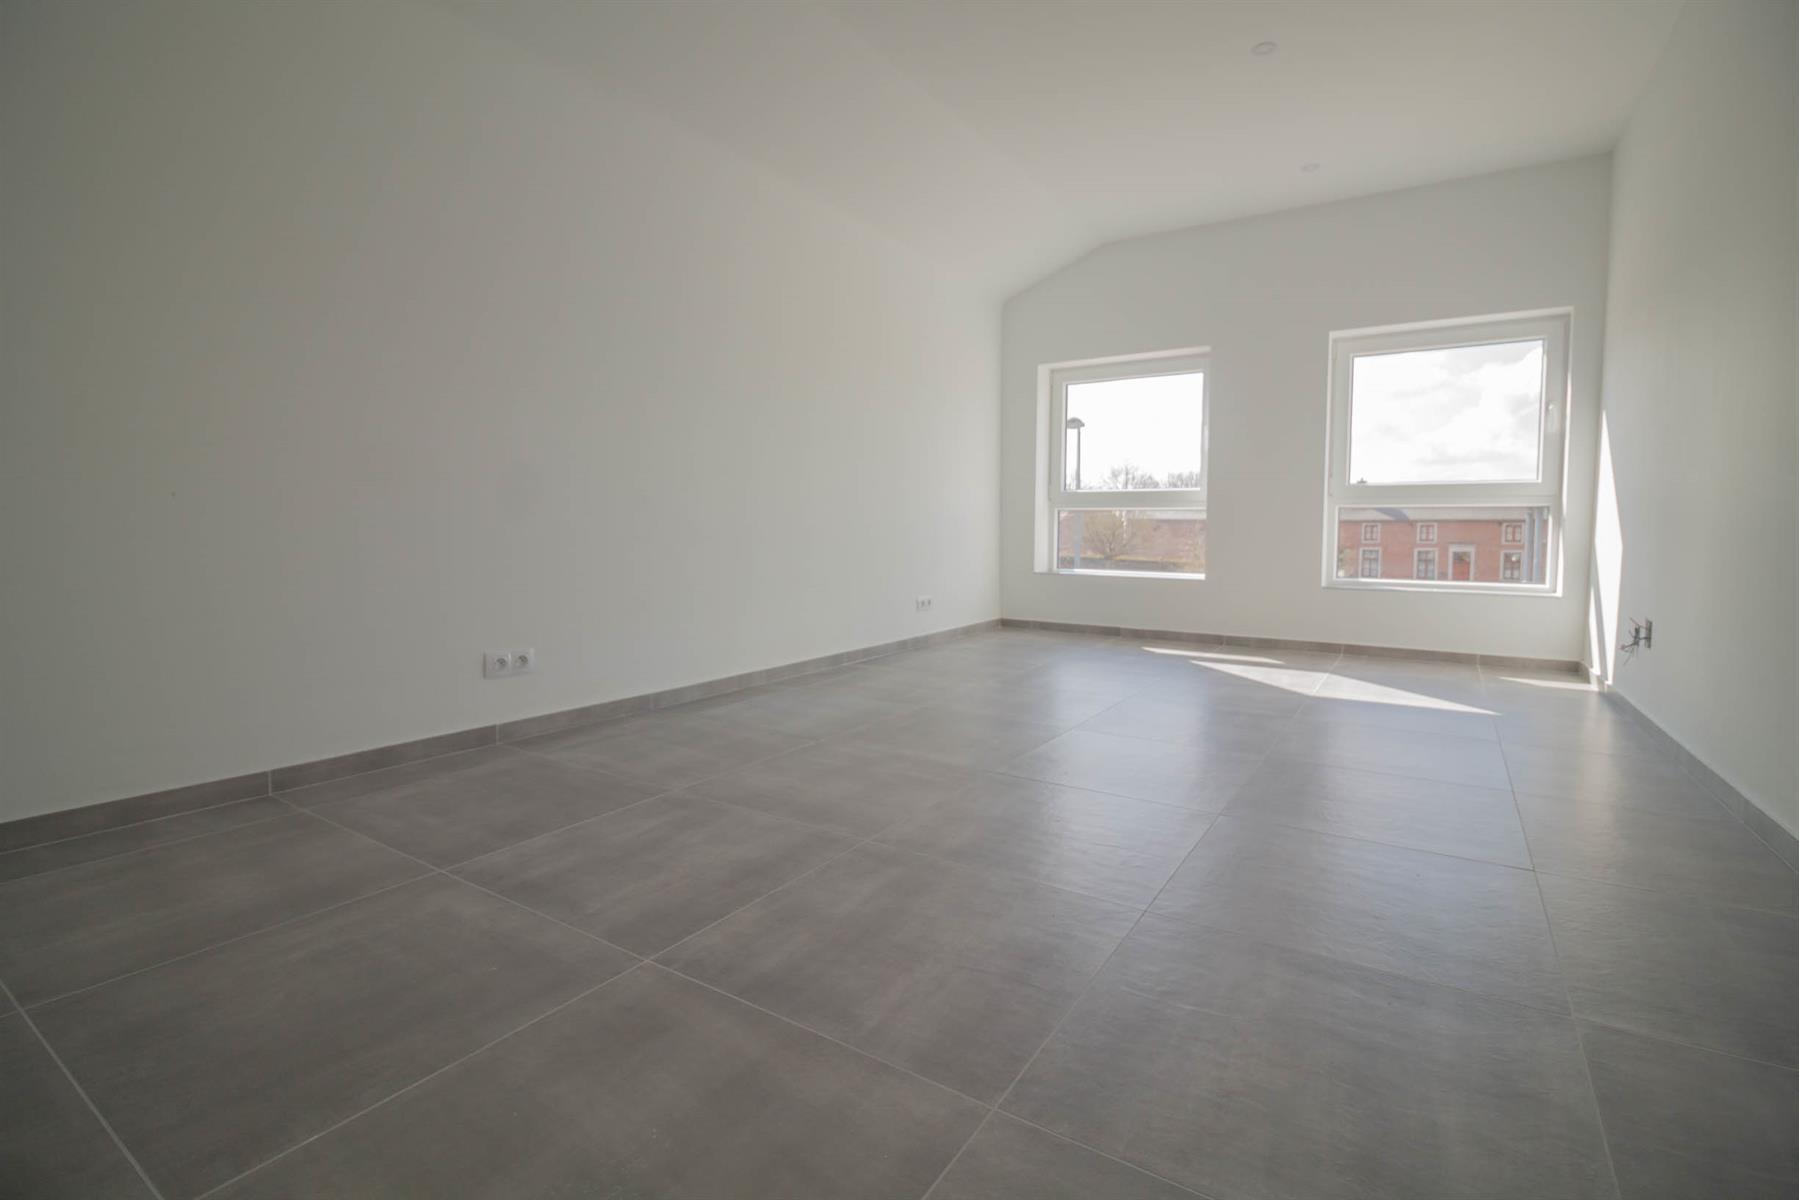 Appartement - Peissant - #4321179-11